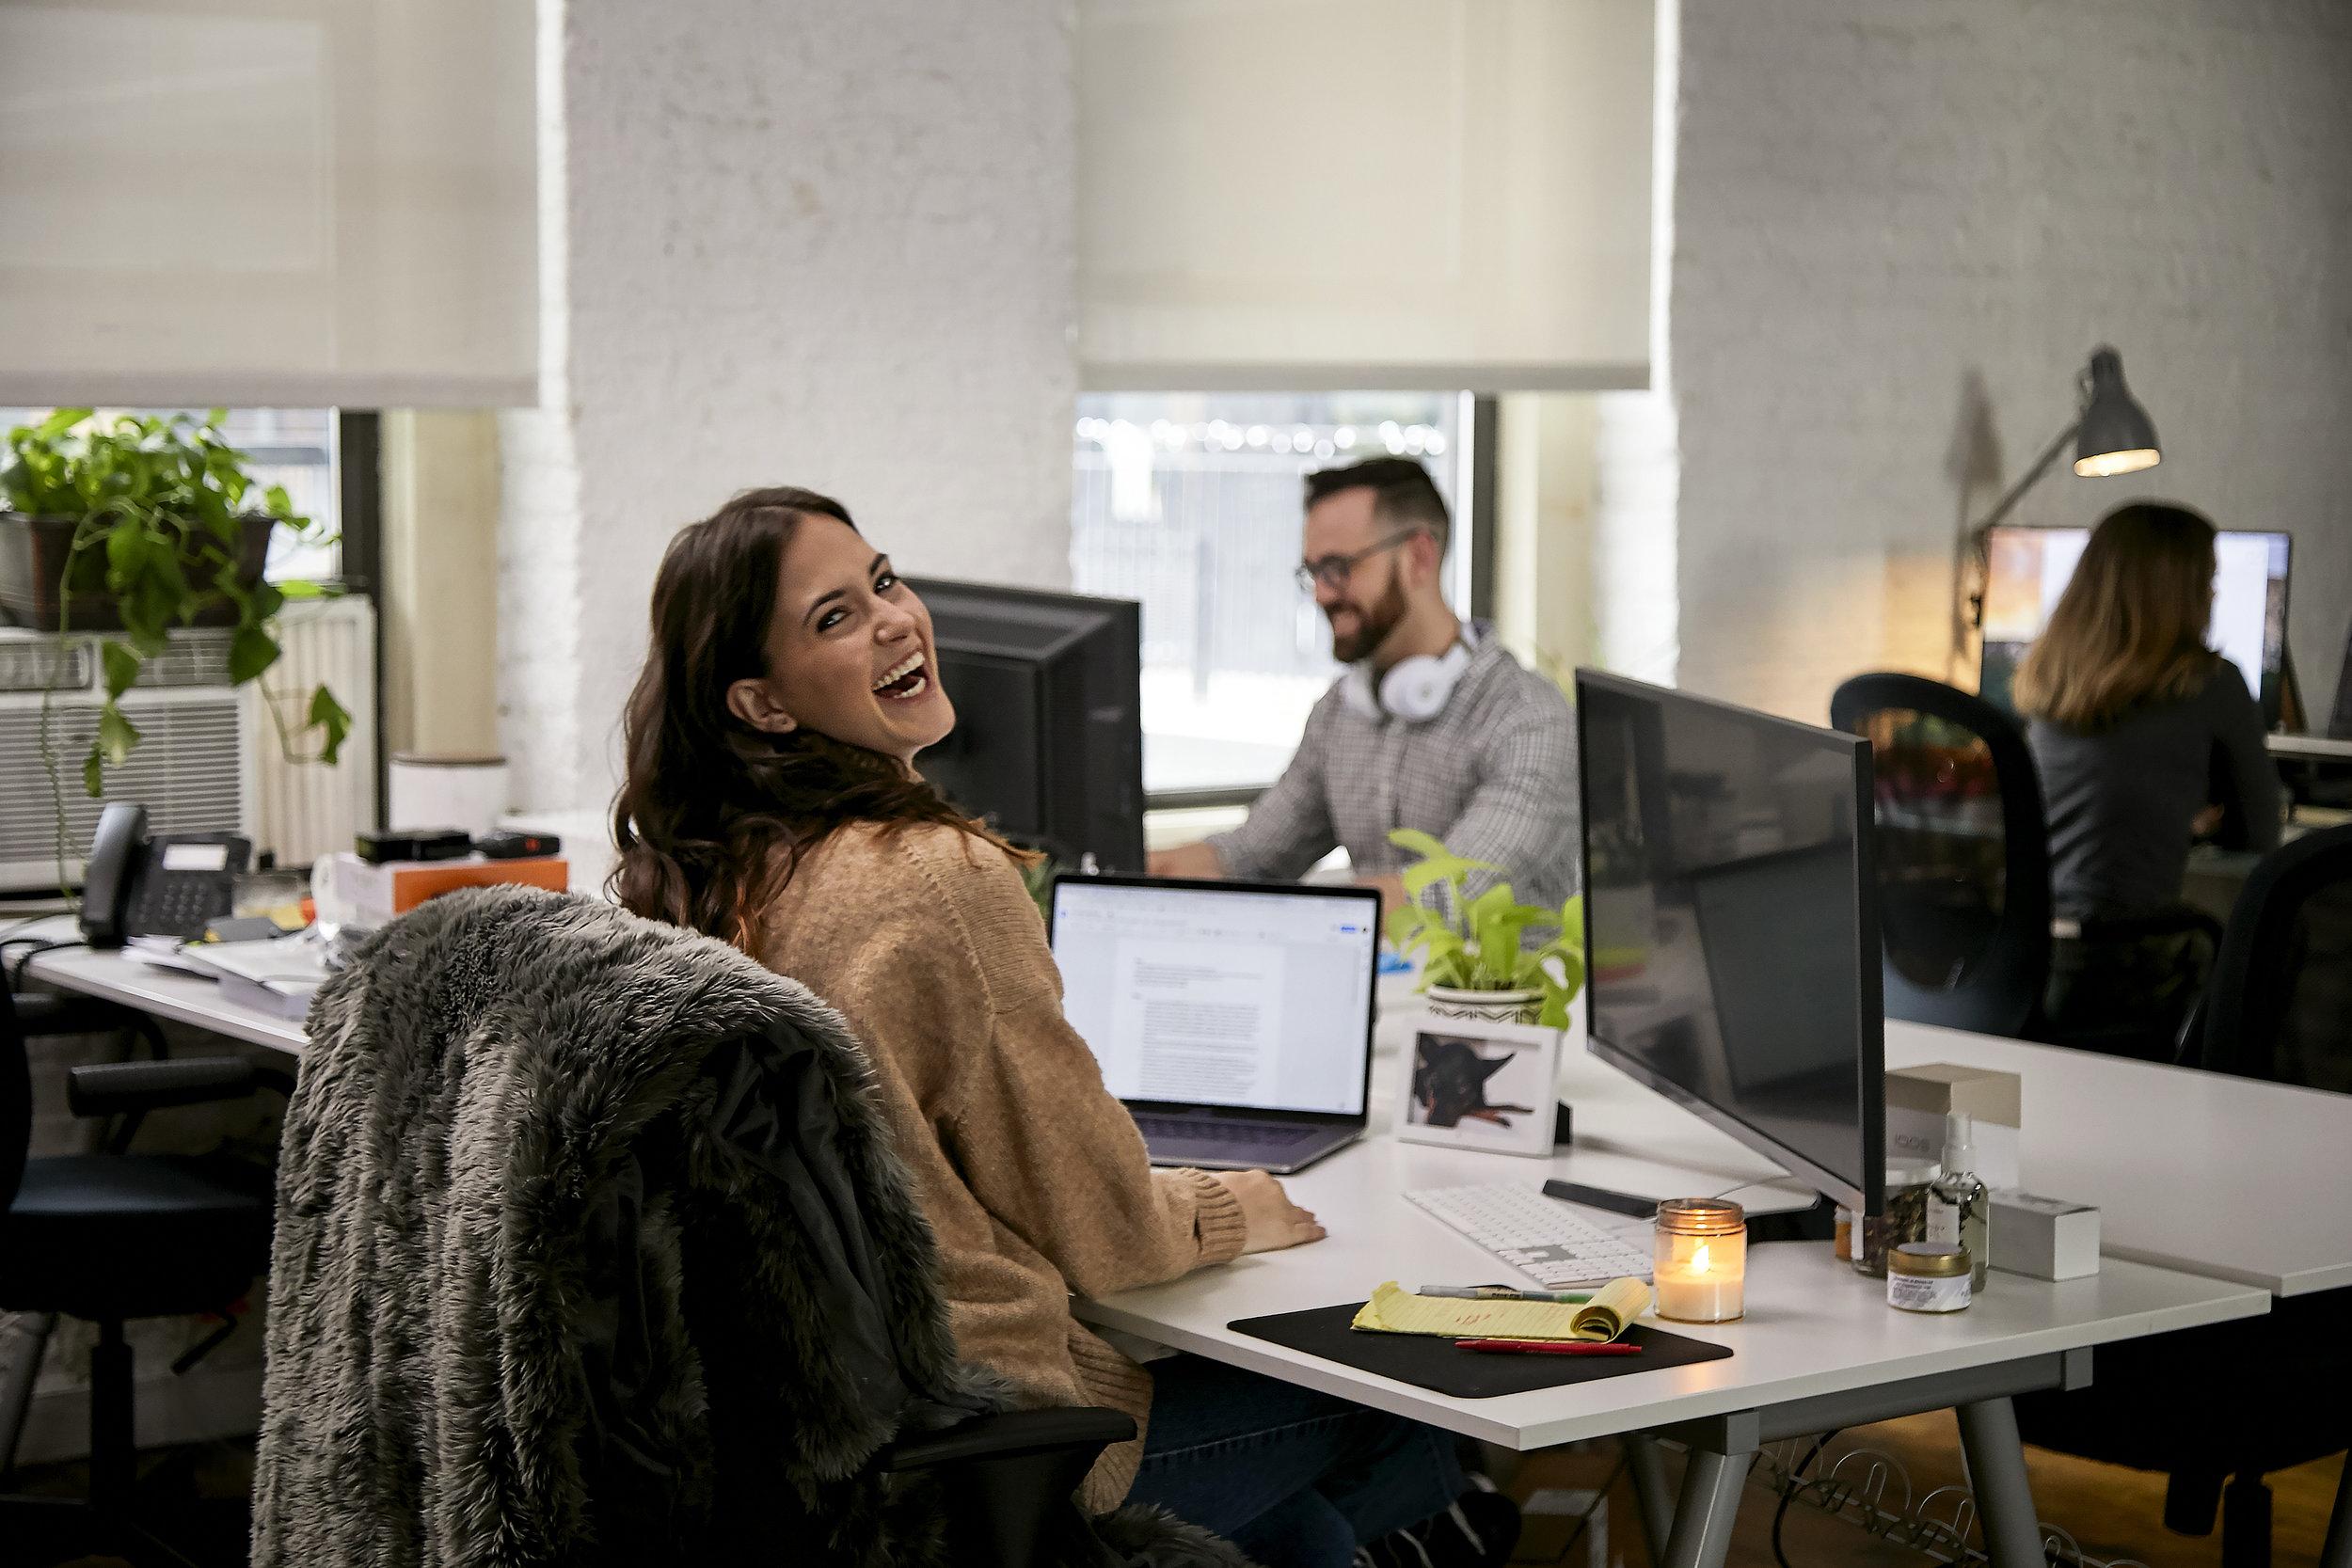 181210_GravityBlankets_Q1_Office_At_Desk_024.jpg